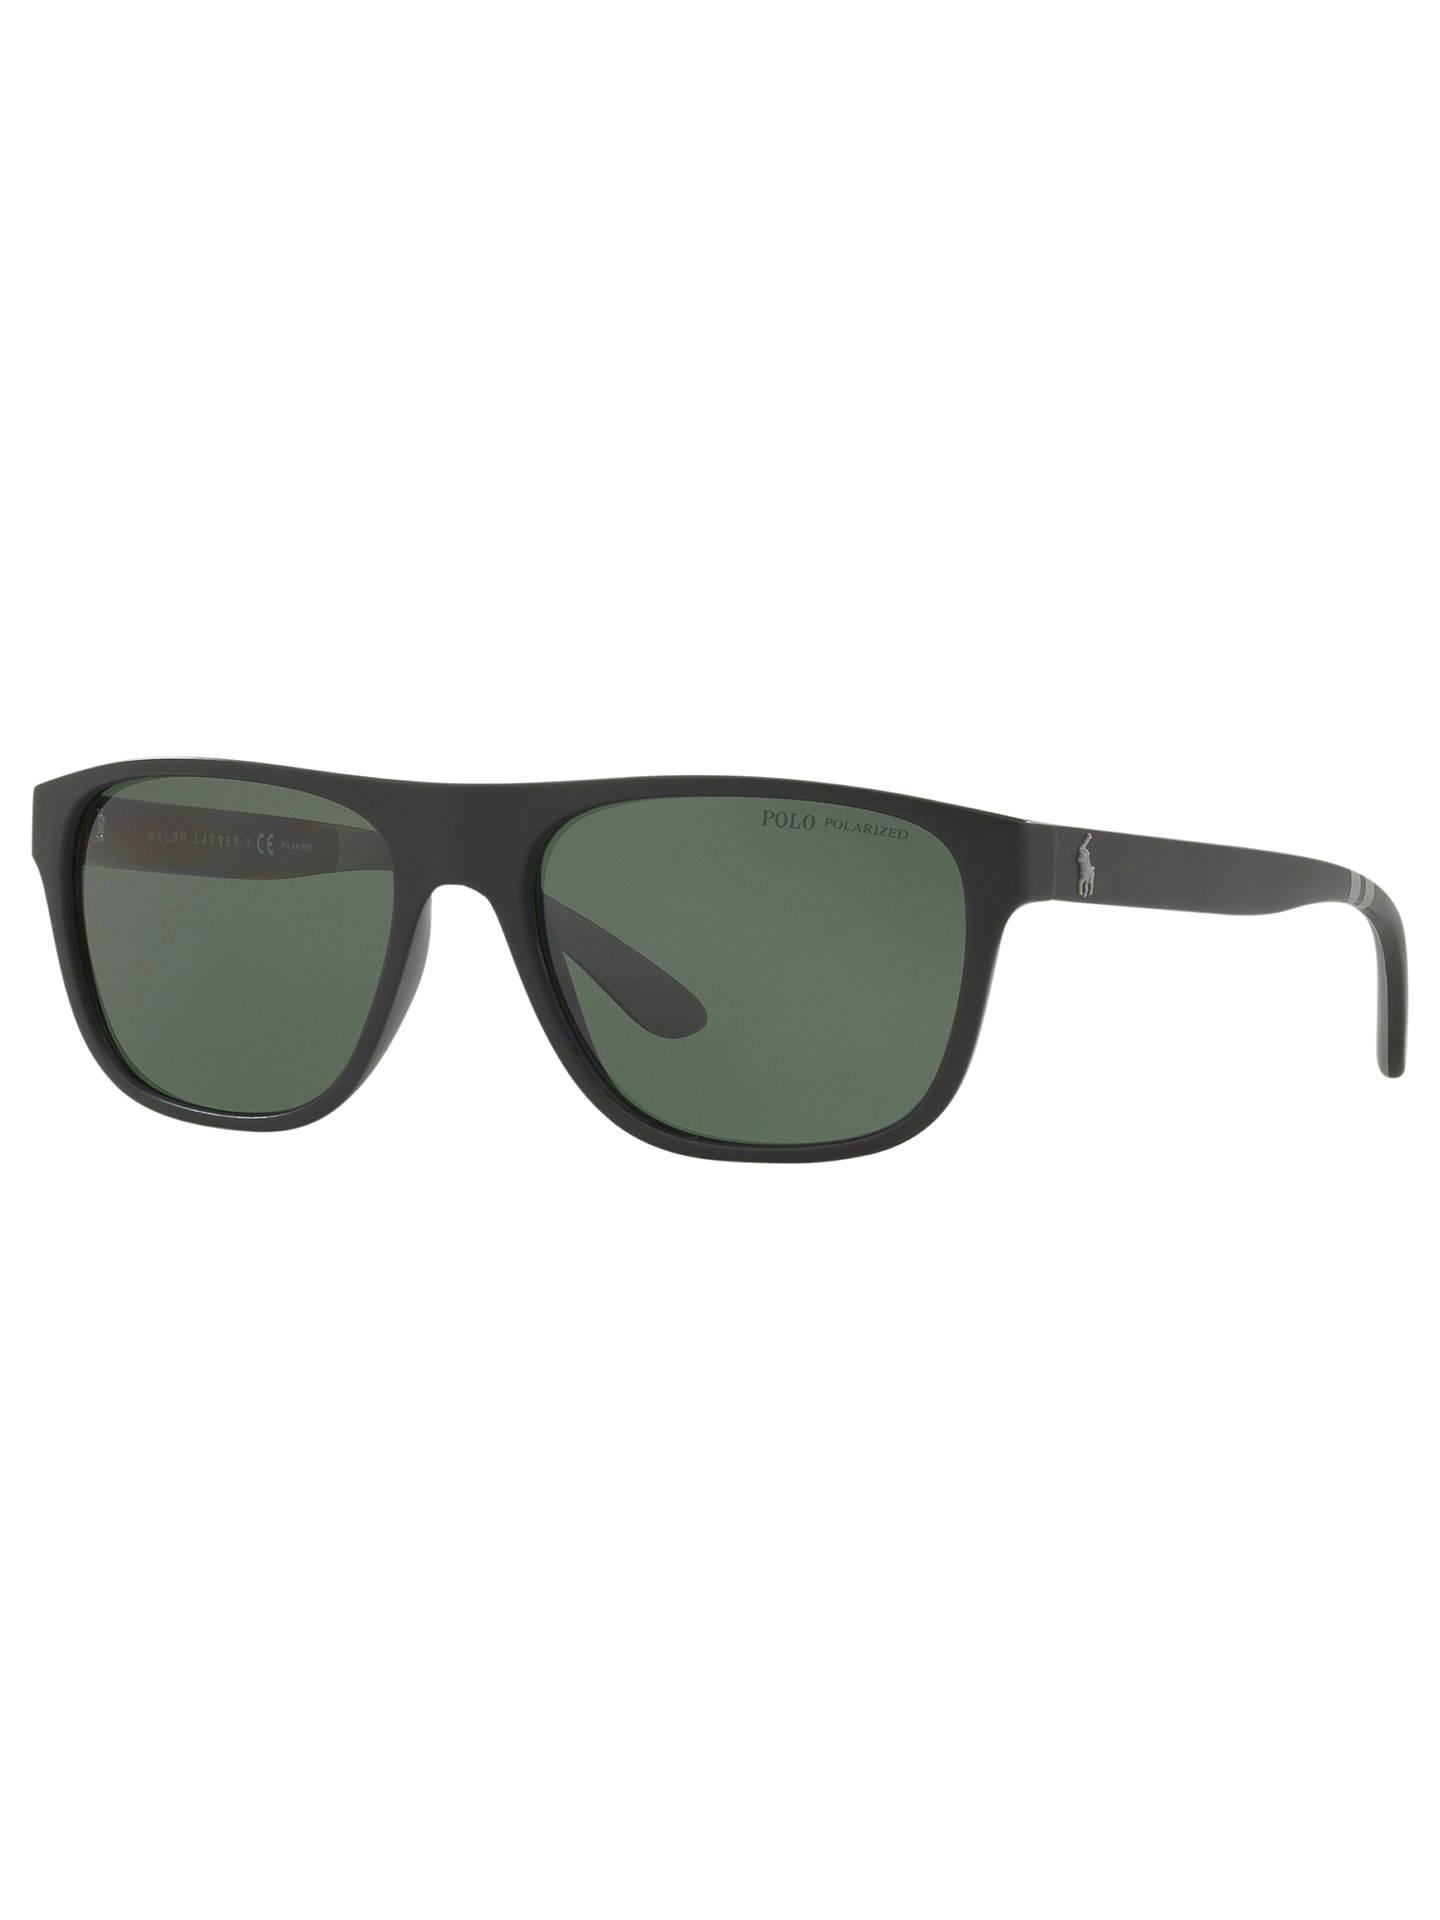 232ca7045e56 ... where to buy buypolo ralph lauren ph4131 mens polarised rectangular sunglasses  matte black green online at